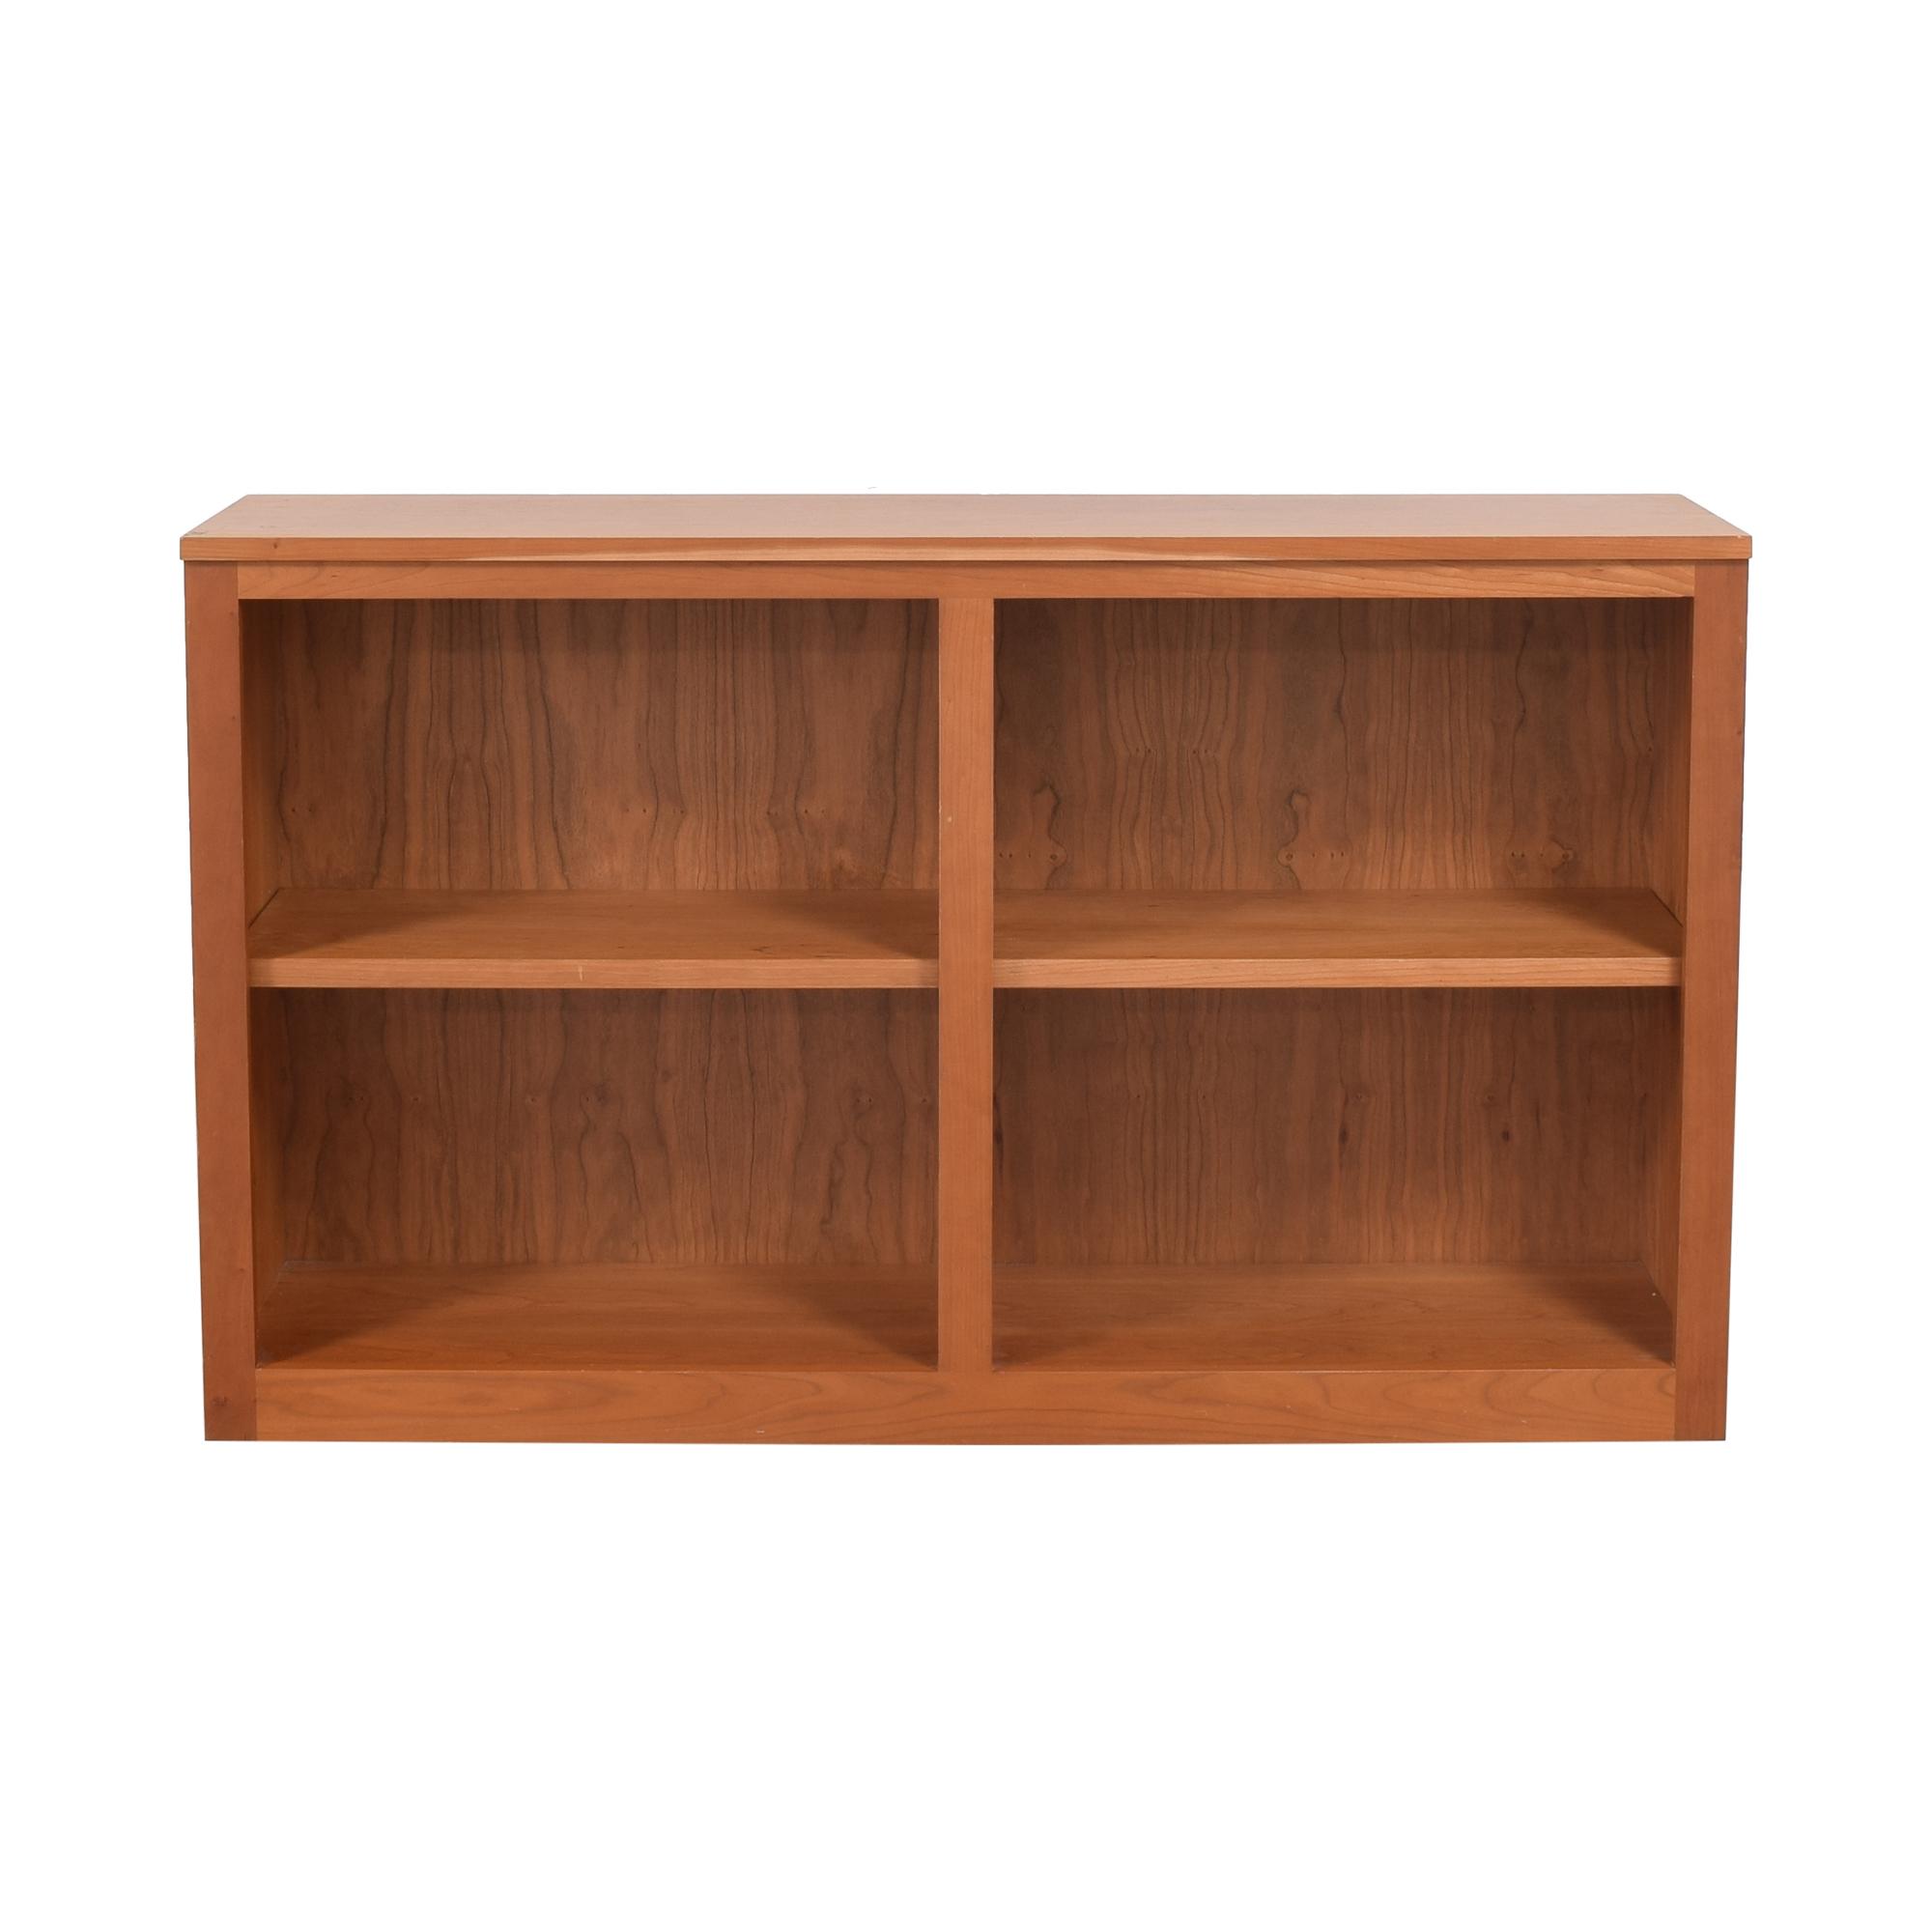 Room & Board Room & Board Woodwind Custom Bookcase Bookcases & Shelving